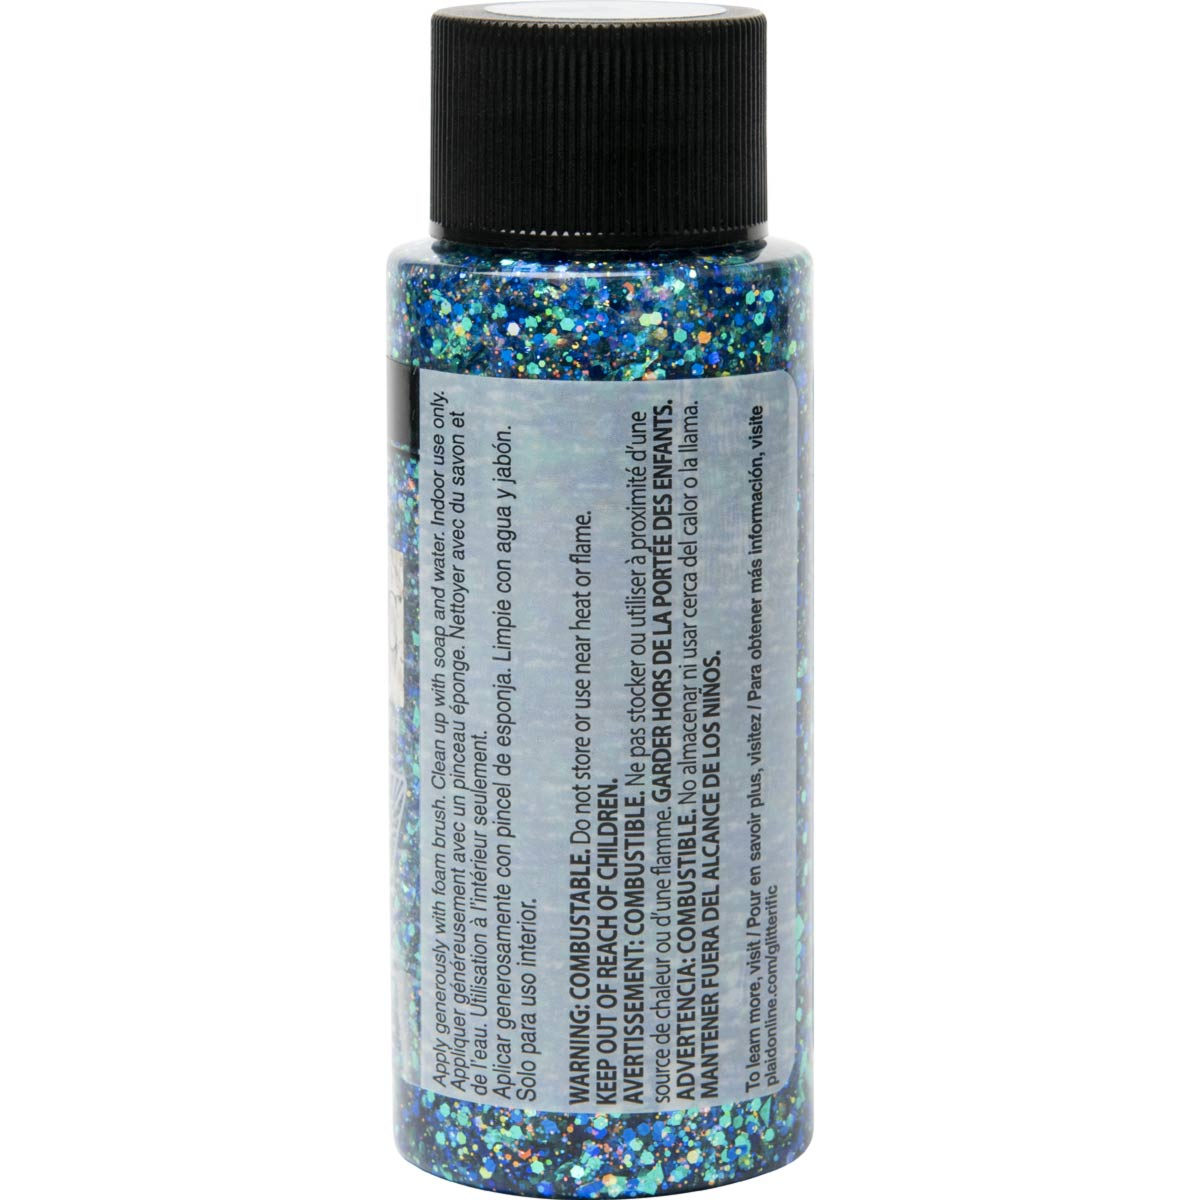 FolkArt ® Glitterific™ Acrylic Paint - Tropical, 2 oz.